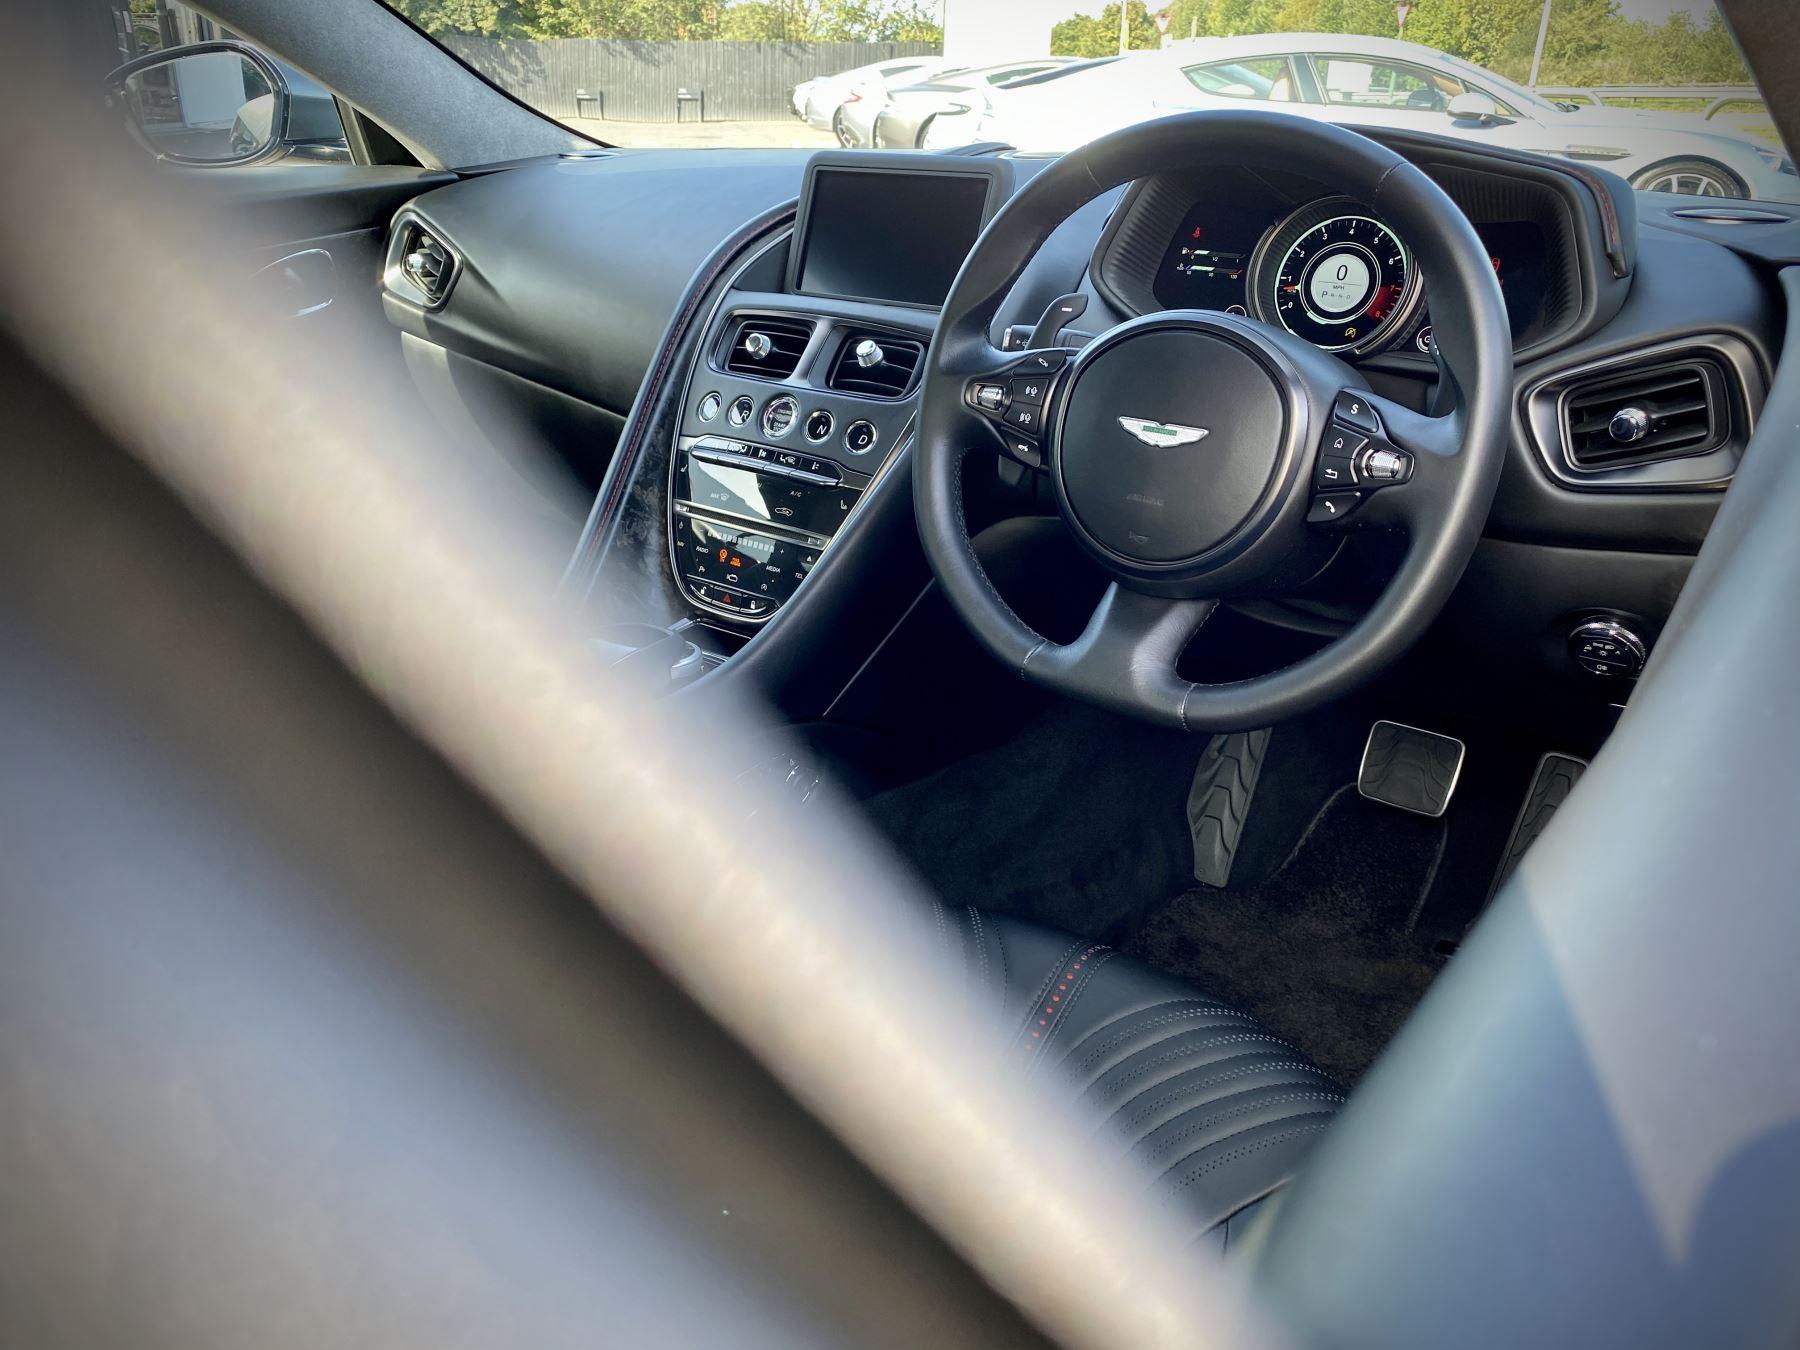 Aston Martin DB11 V12 2dr Touchtronic image 12